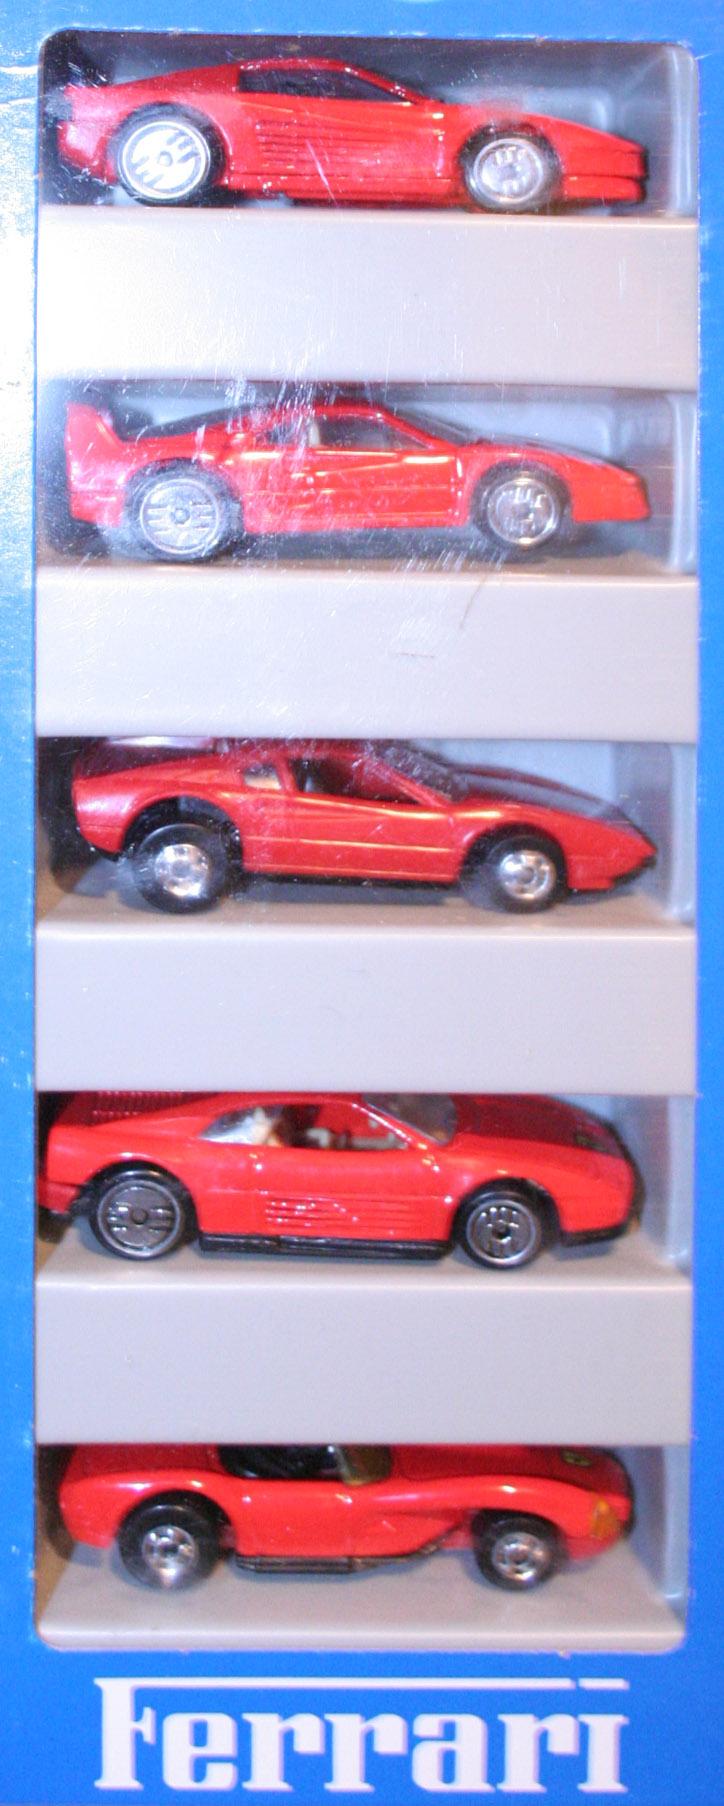 Ferrari 5-Pack (1994)